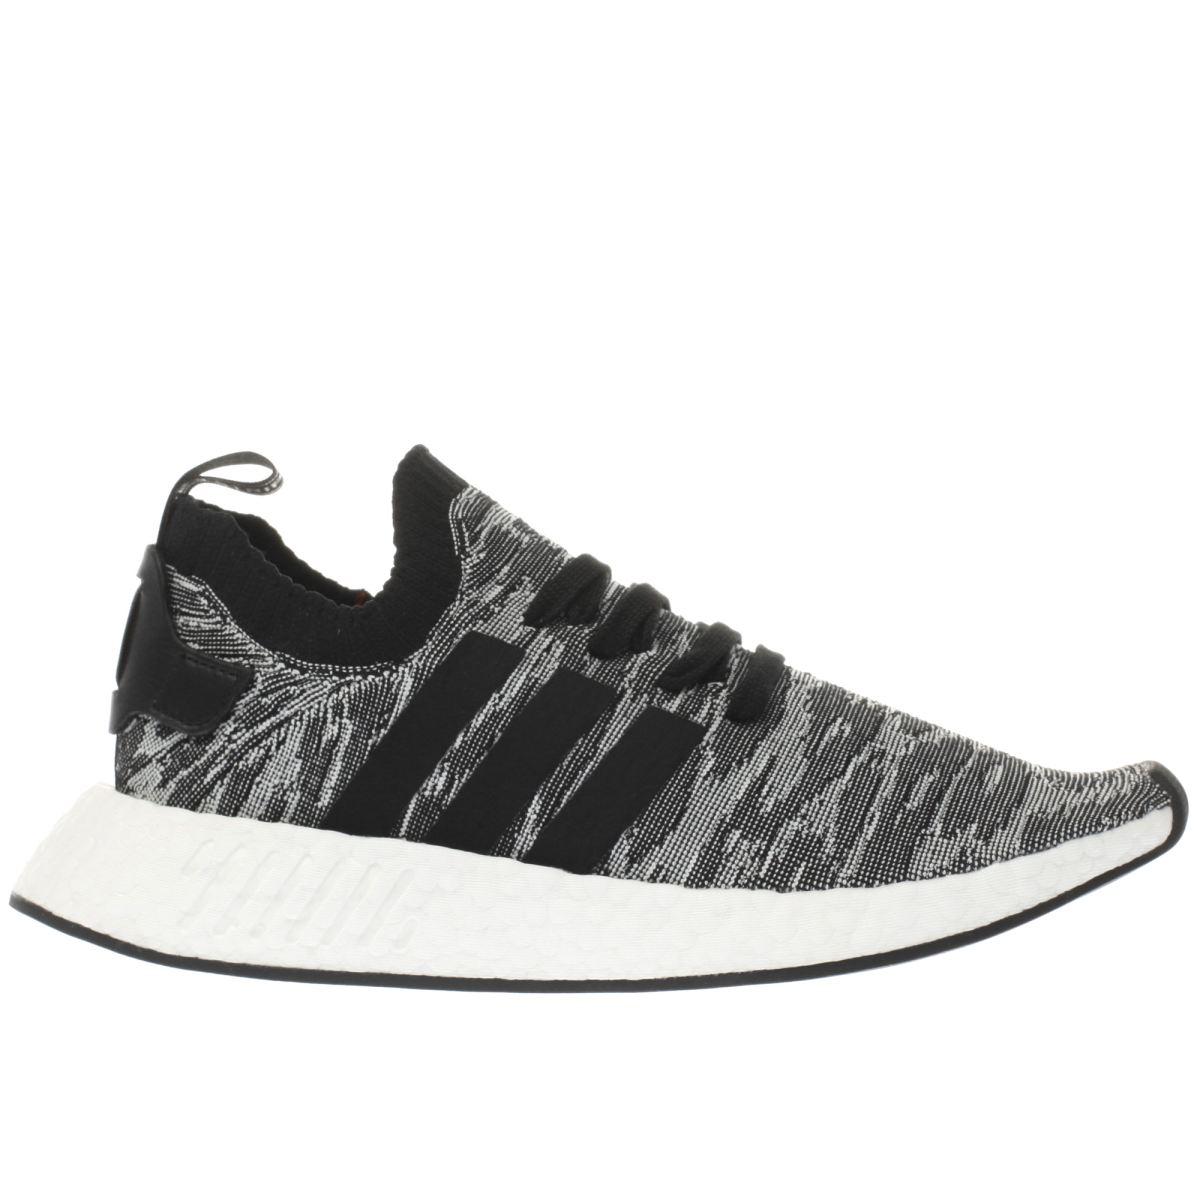 adidas grey & black nmd_r2 primeknit trainers